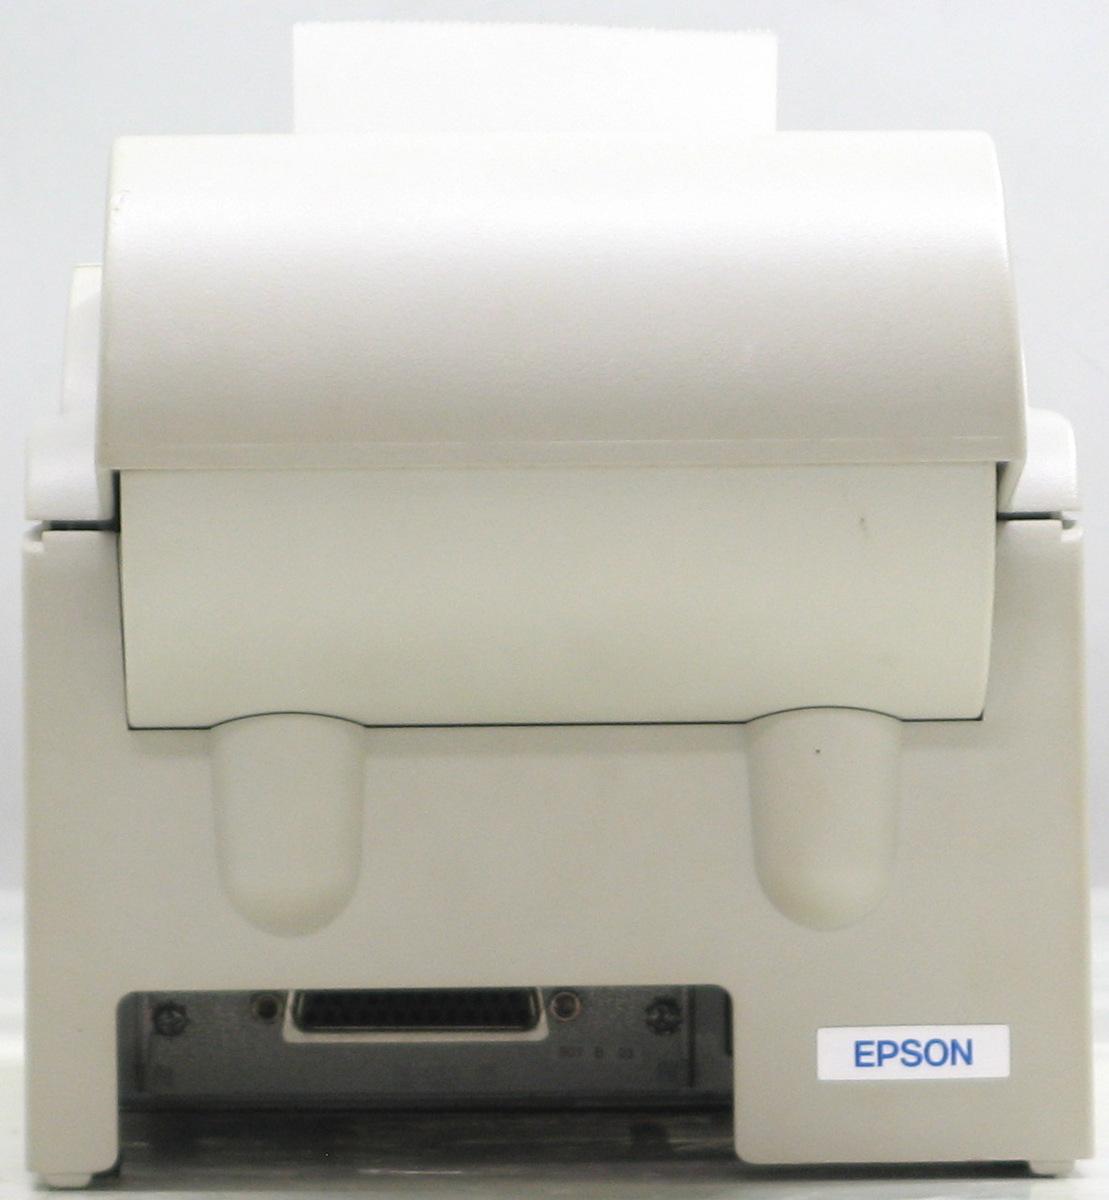 L-315/EPSON TM-U220A MODEL M188A